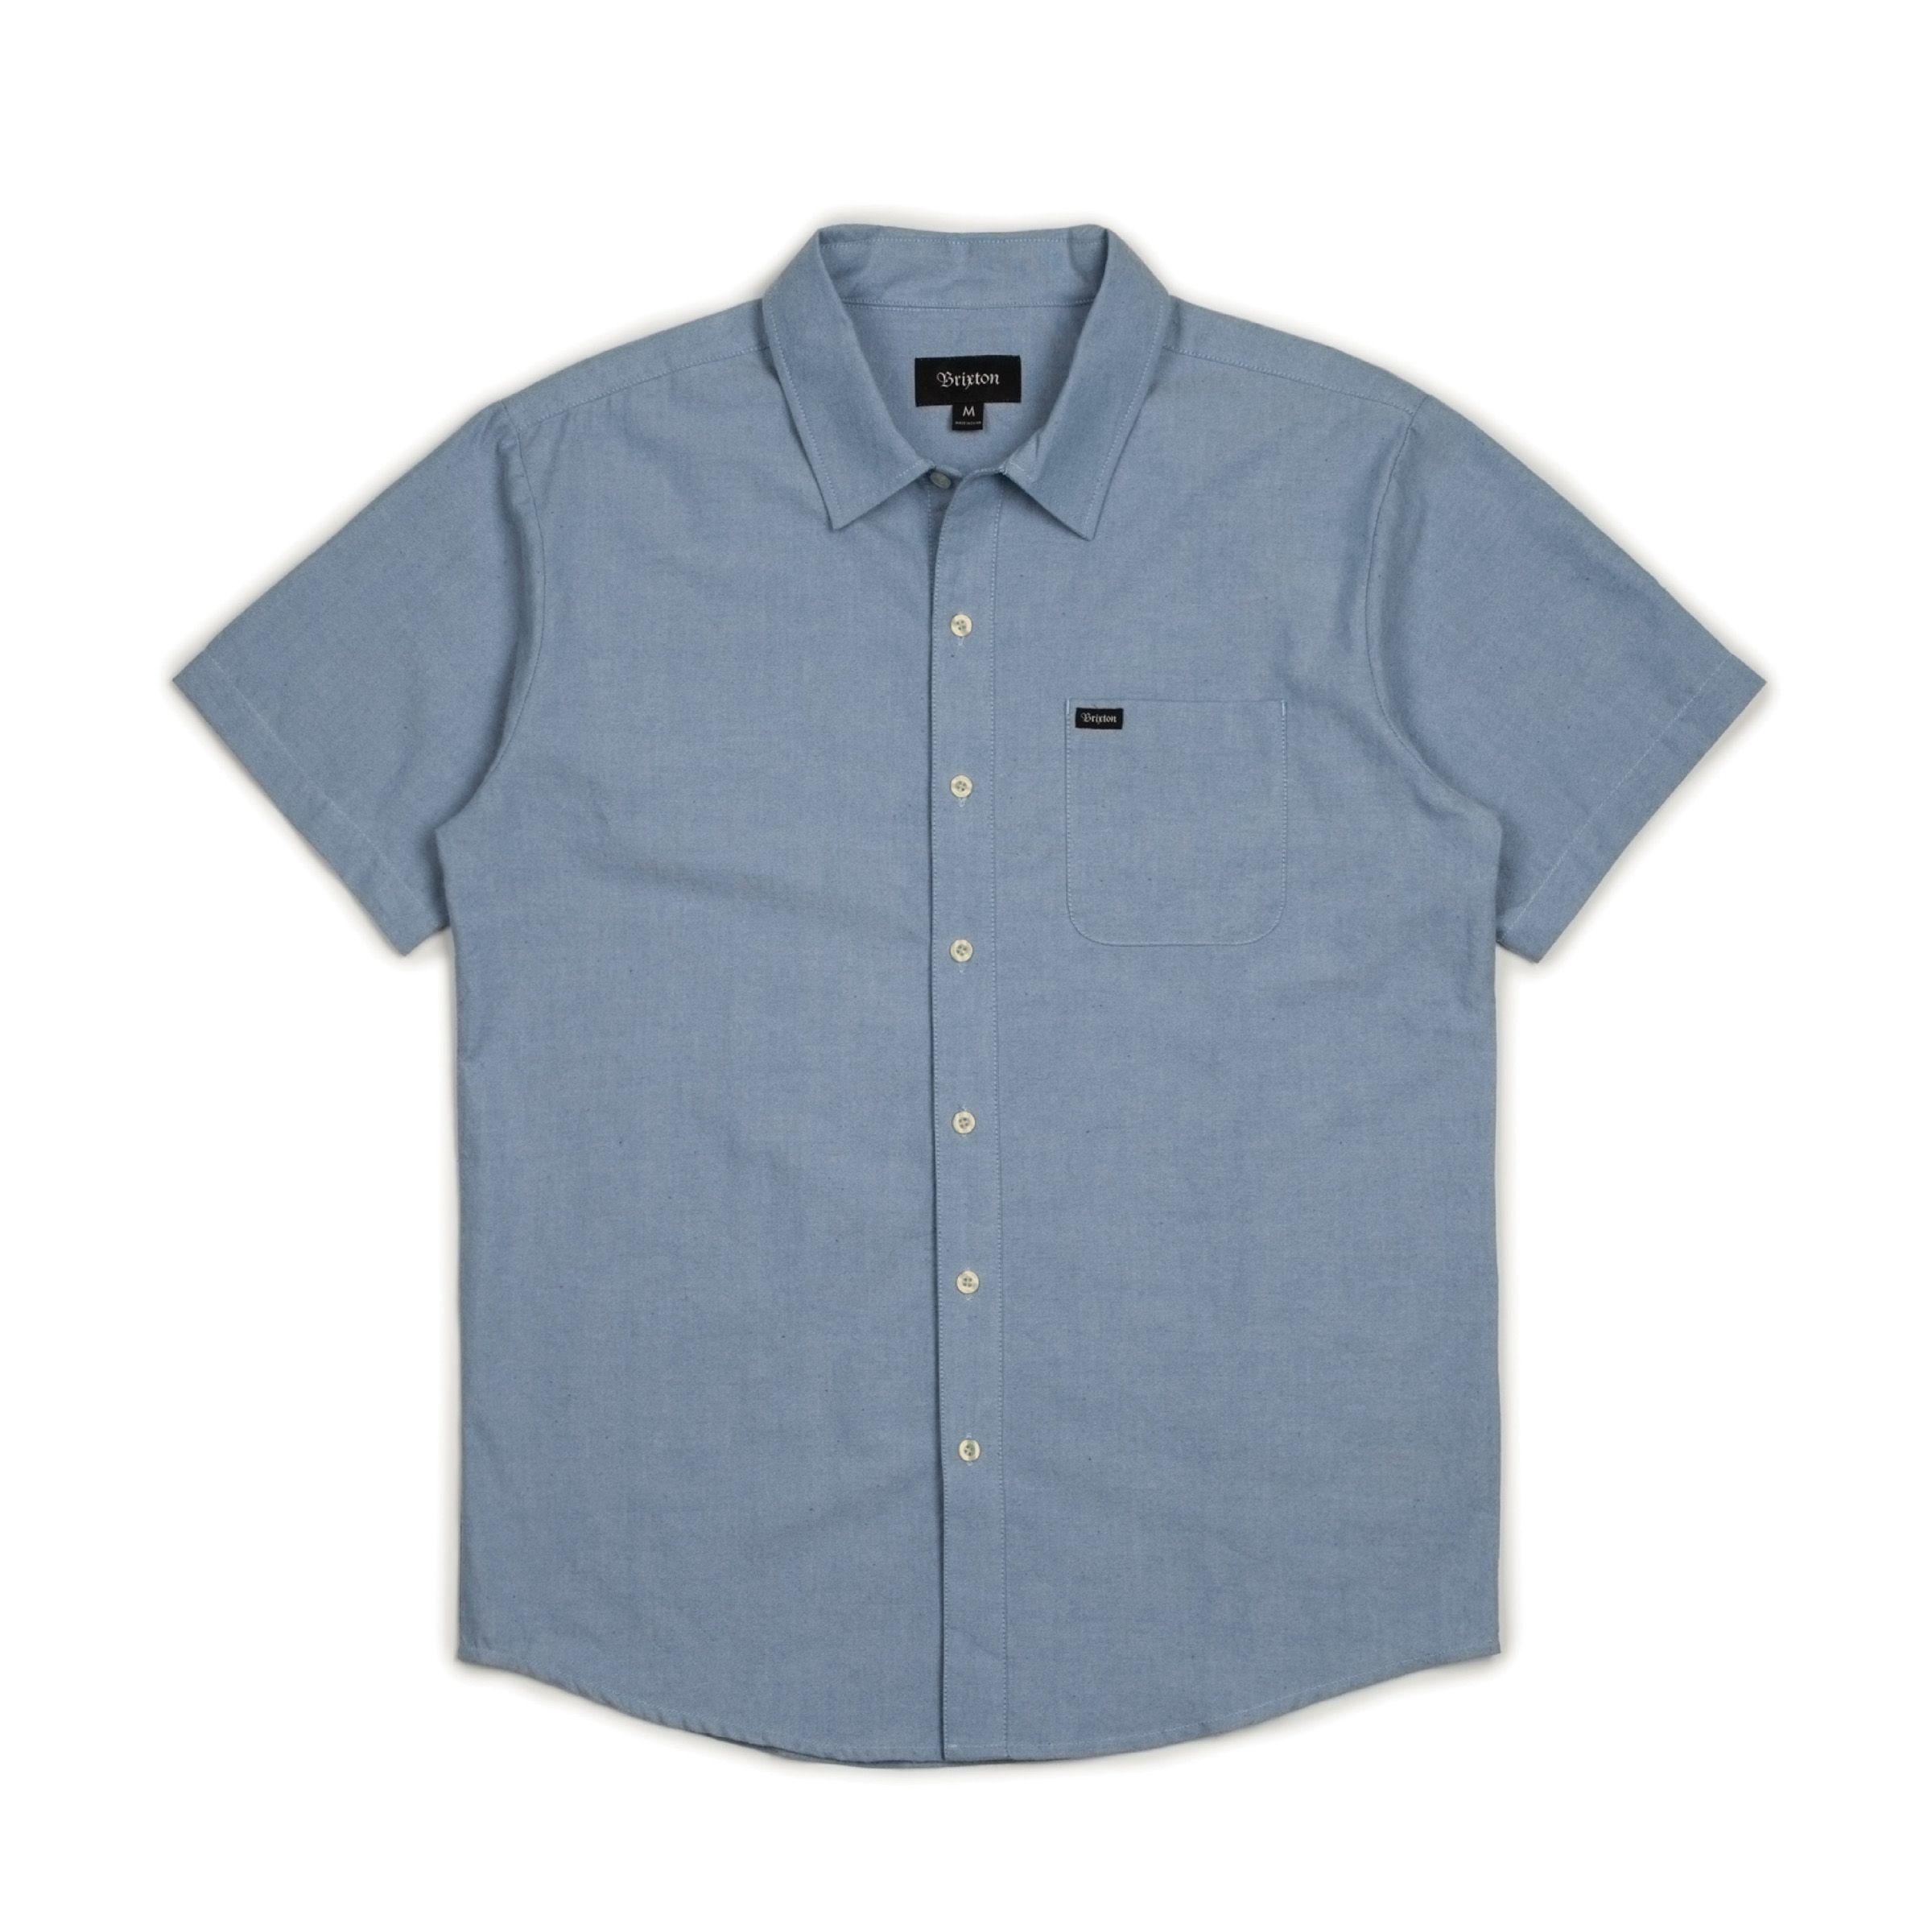 Brixton S/S Oxford Shirts_b0121563_13511410.jpg